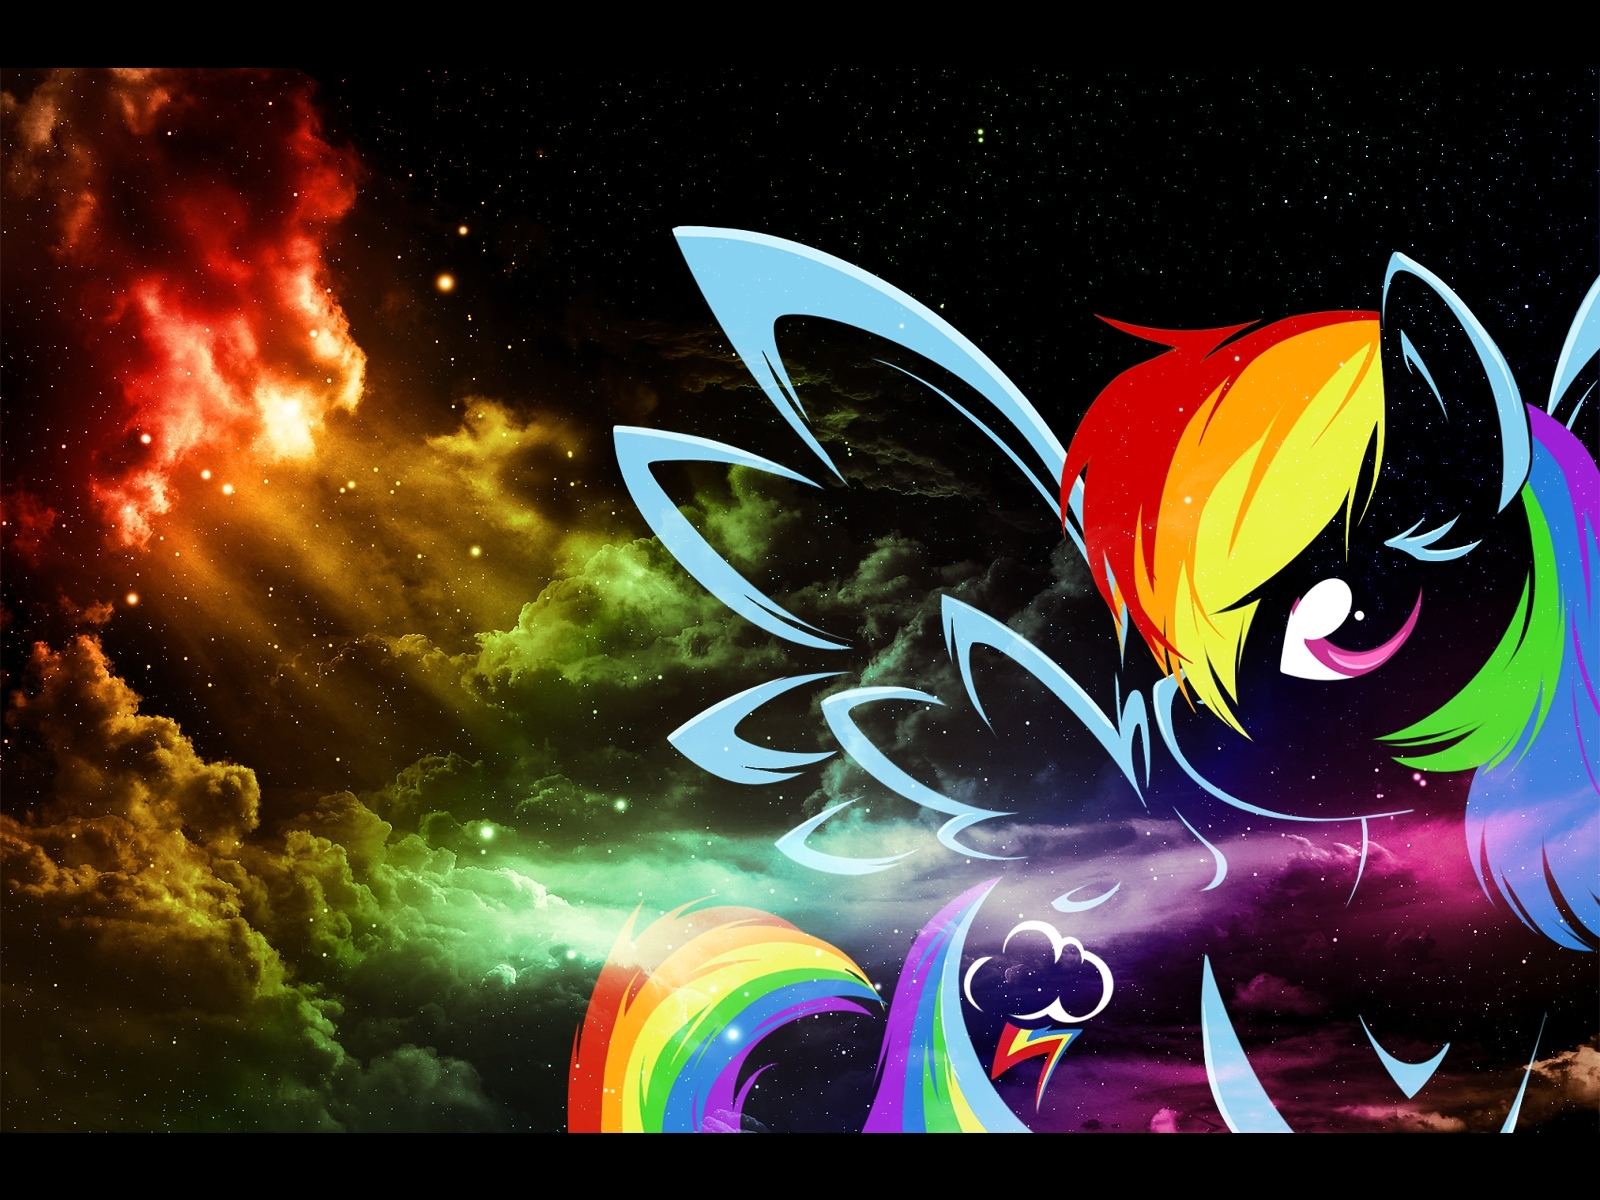 rainbow-dash-wallpapers-my-little-pony-friendship-is-magic | mlprainbow